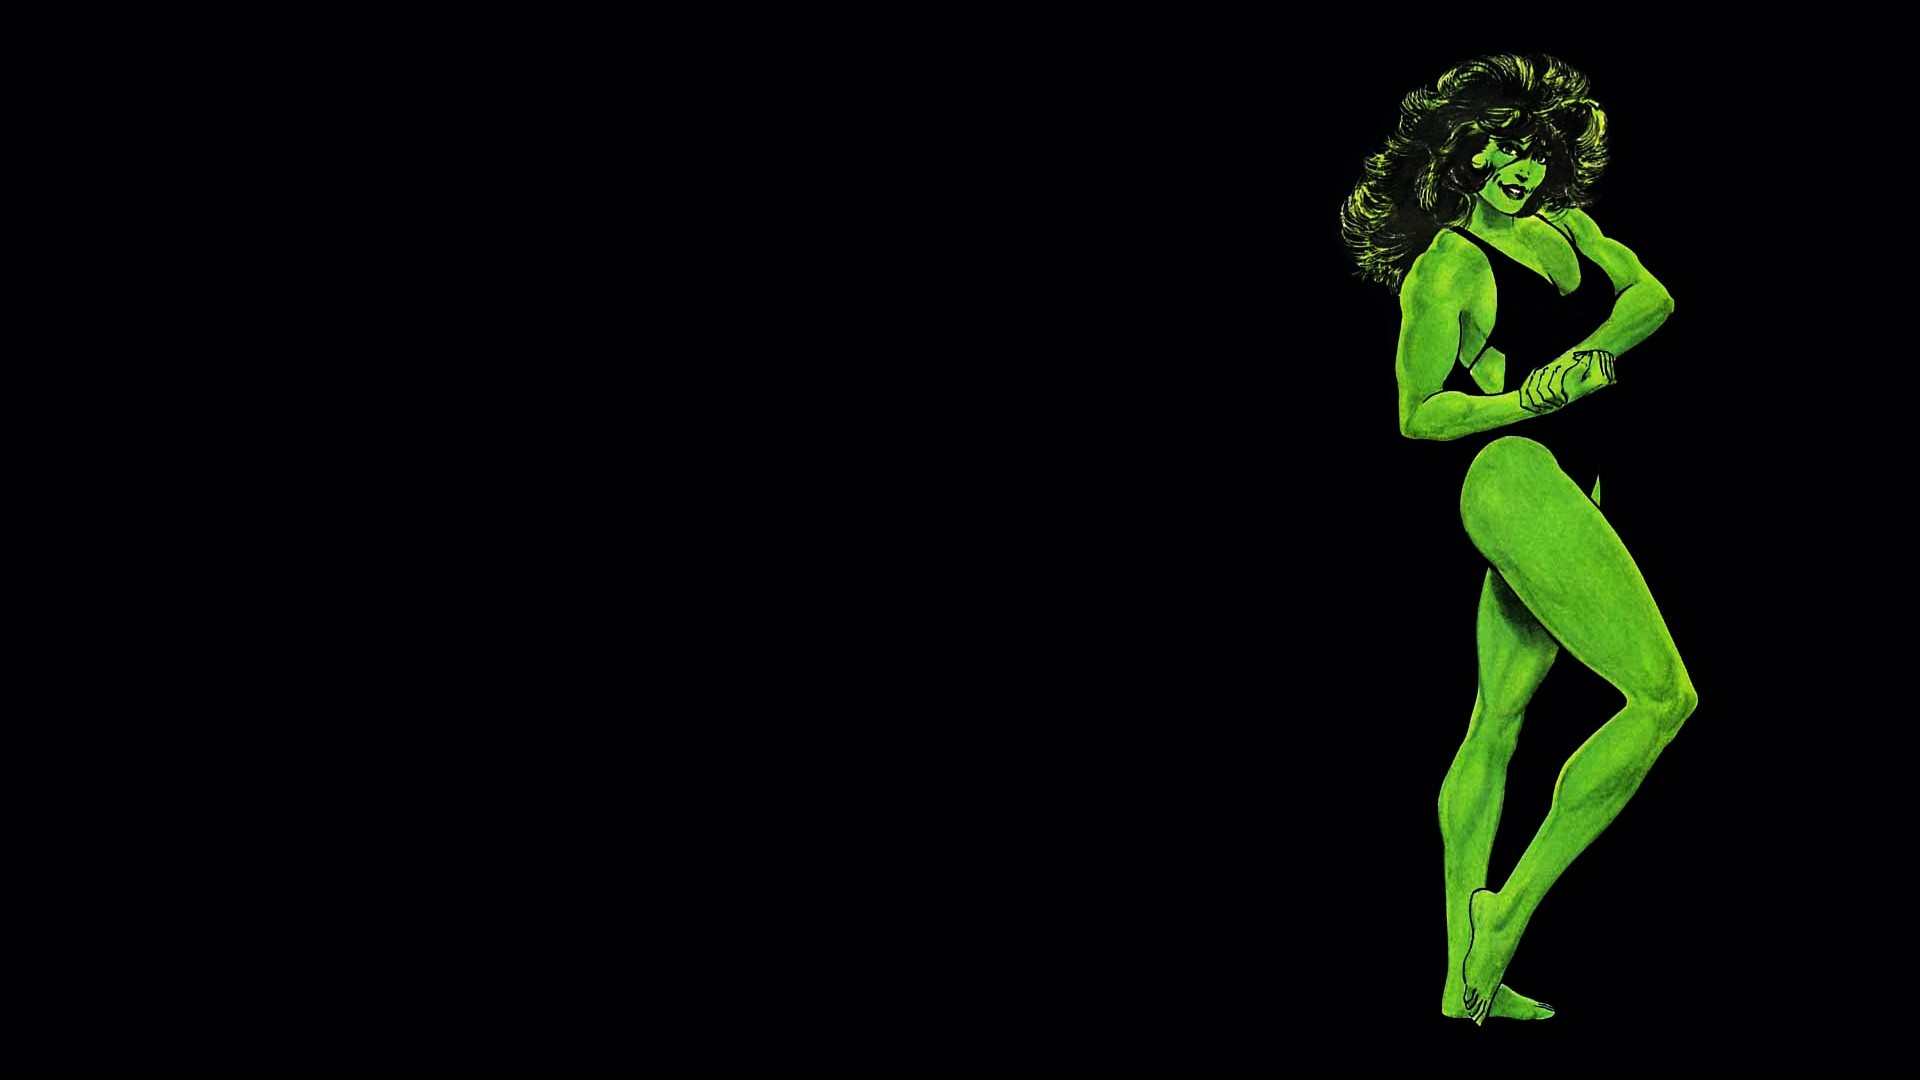 She-Hulk images She-Hulk – Barefoot HD wallpaper and background photos